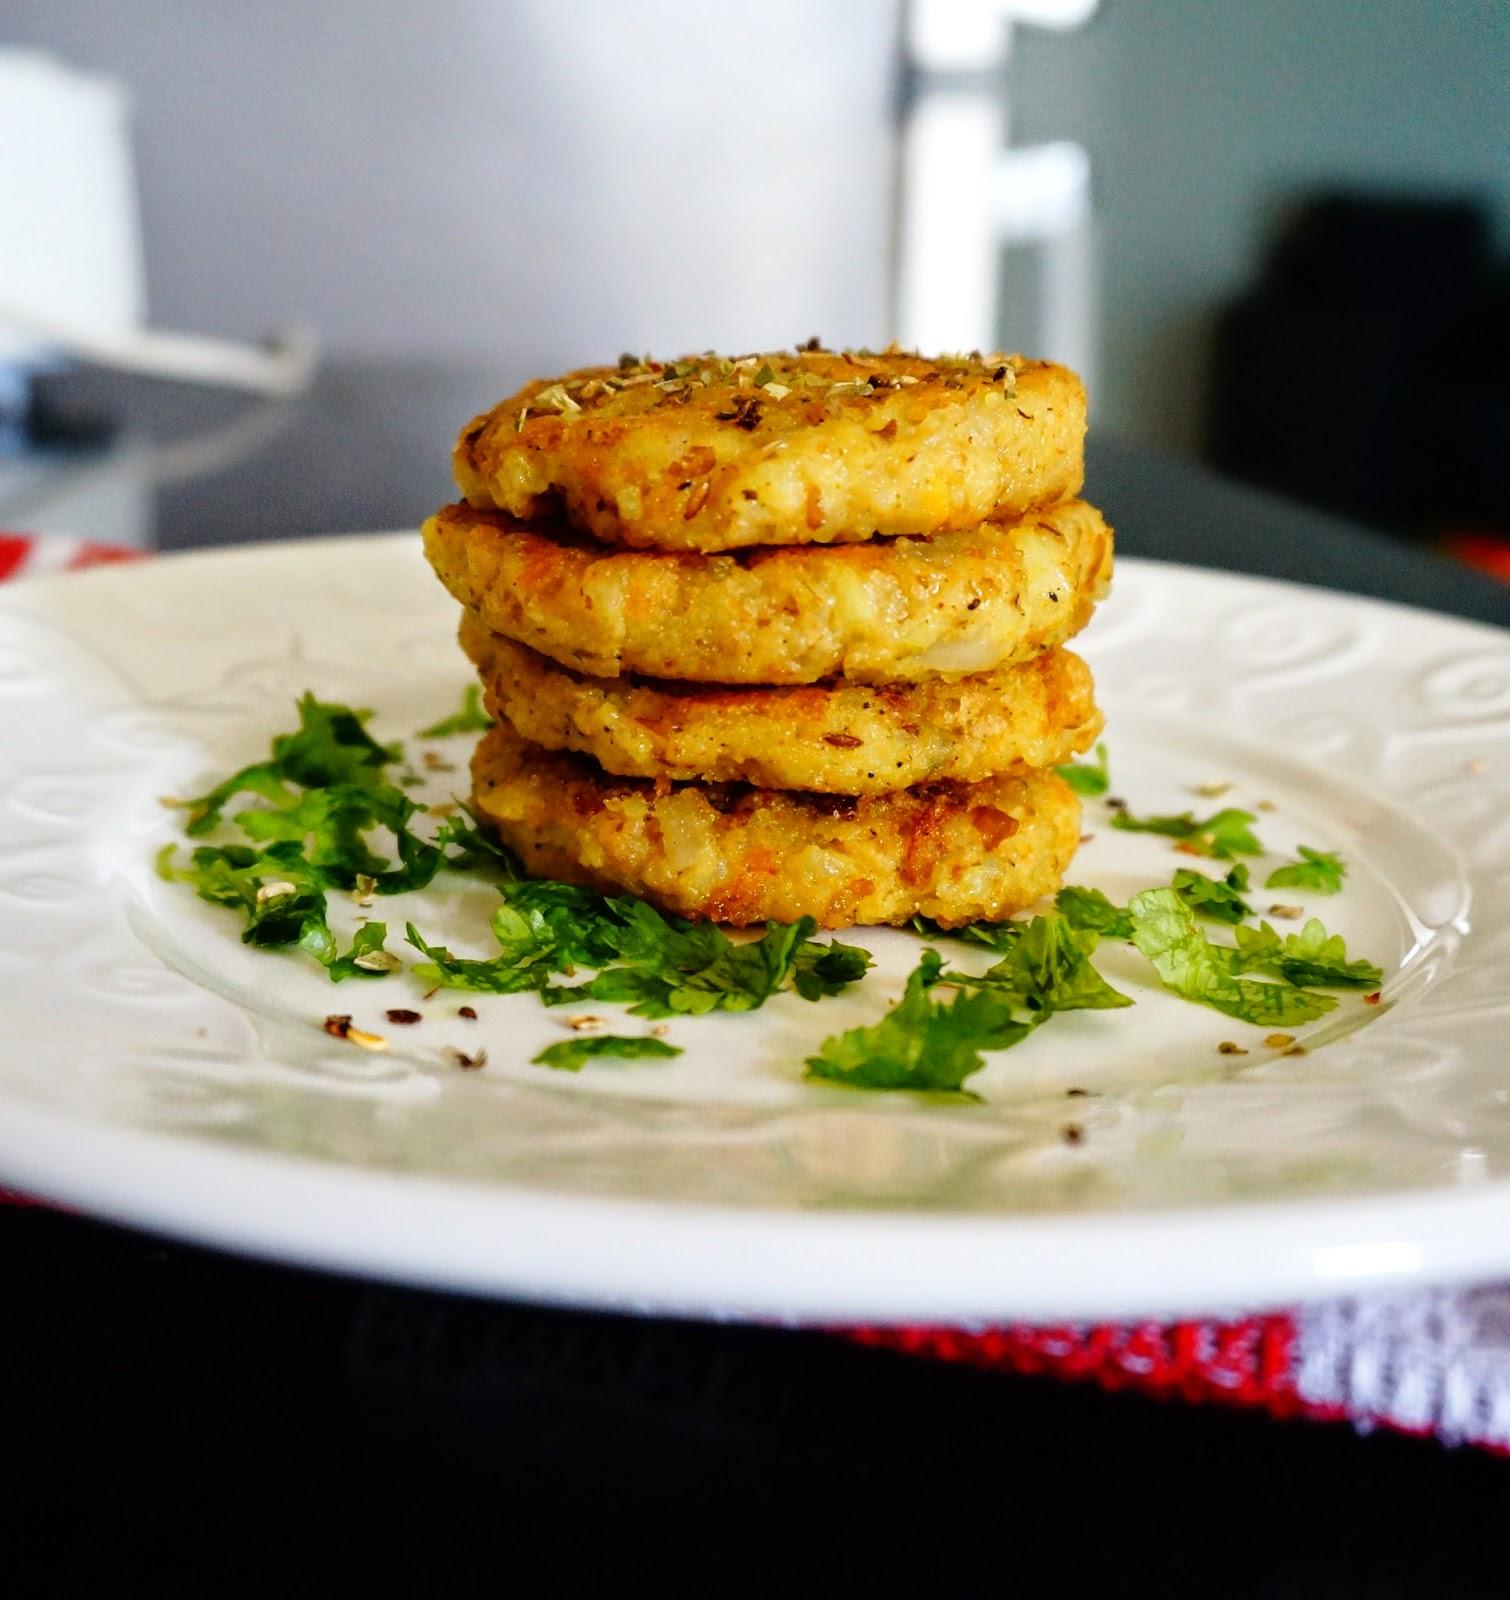 Leftoverrecipes,Bengalgramcutlets,ricecutlets,leftoverbengalgramcutlets,tikki,cutlets,pancake,leftover,vegetarian,Indiancuisine